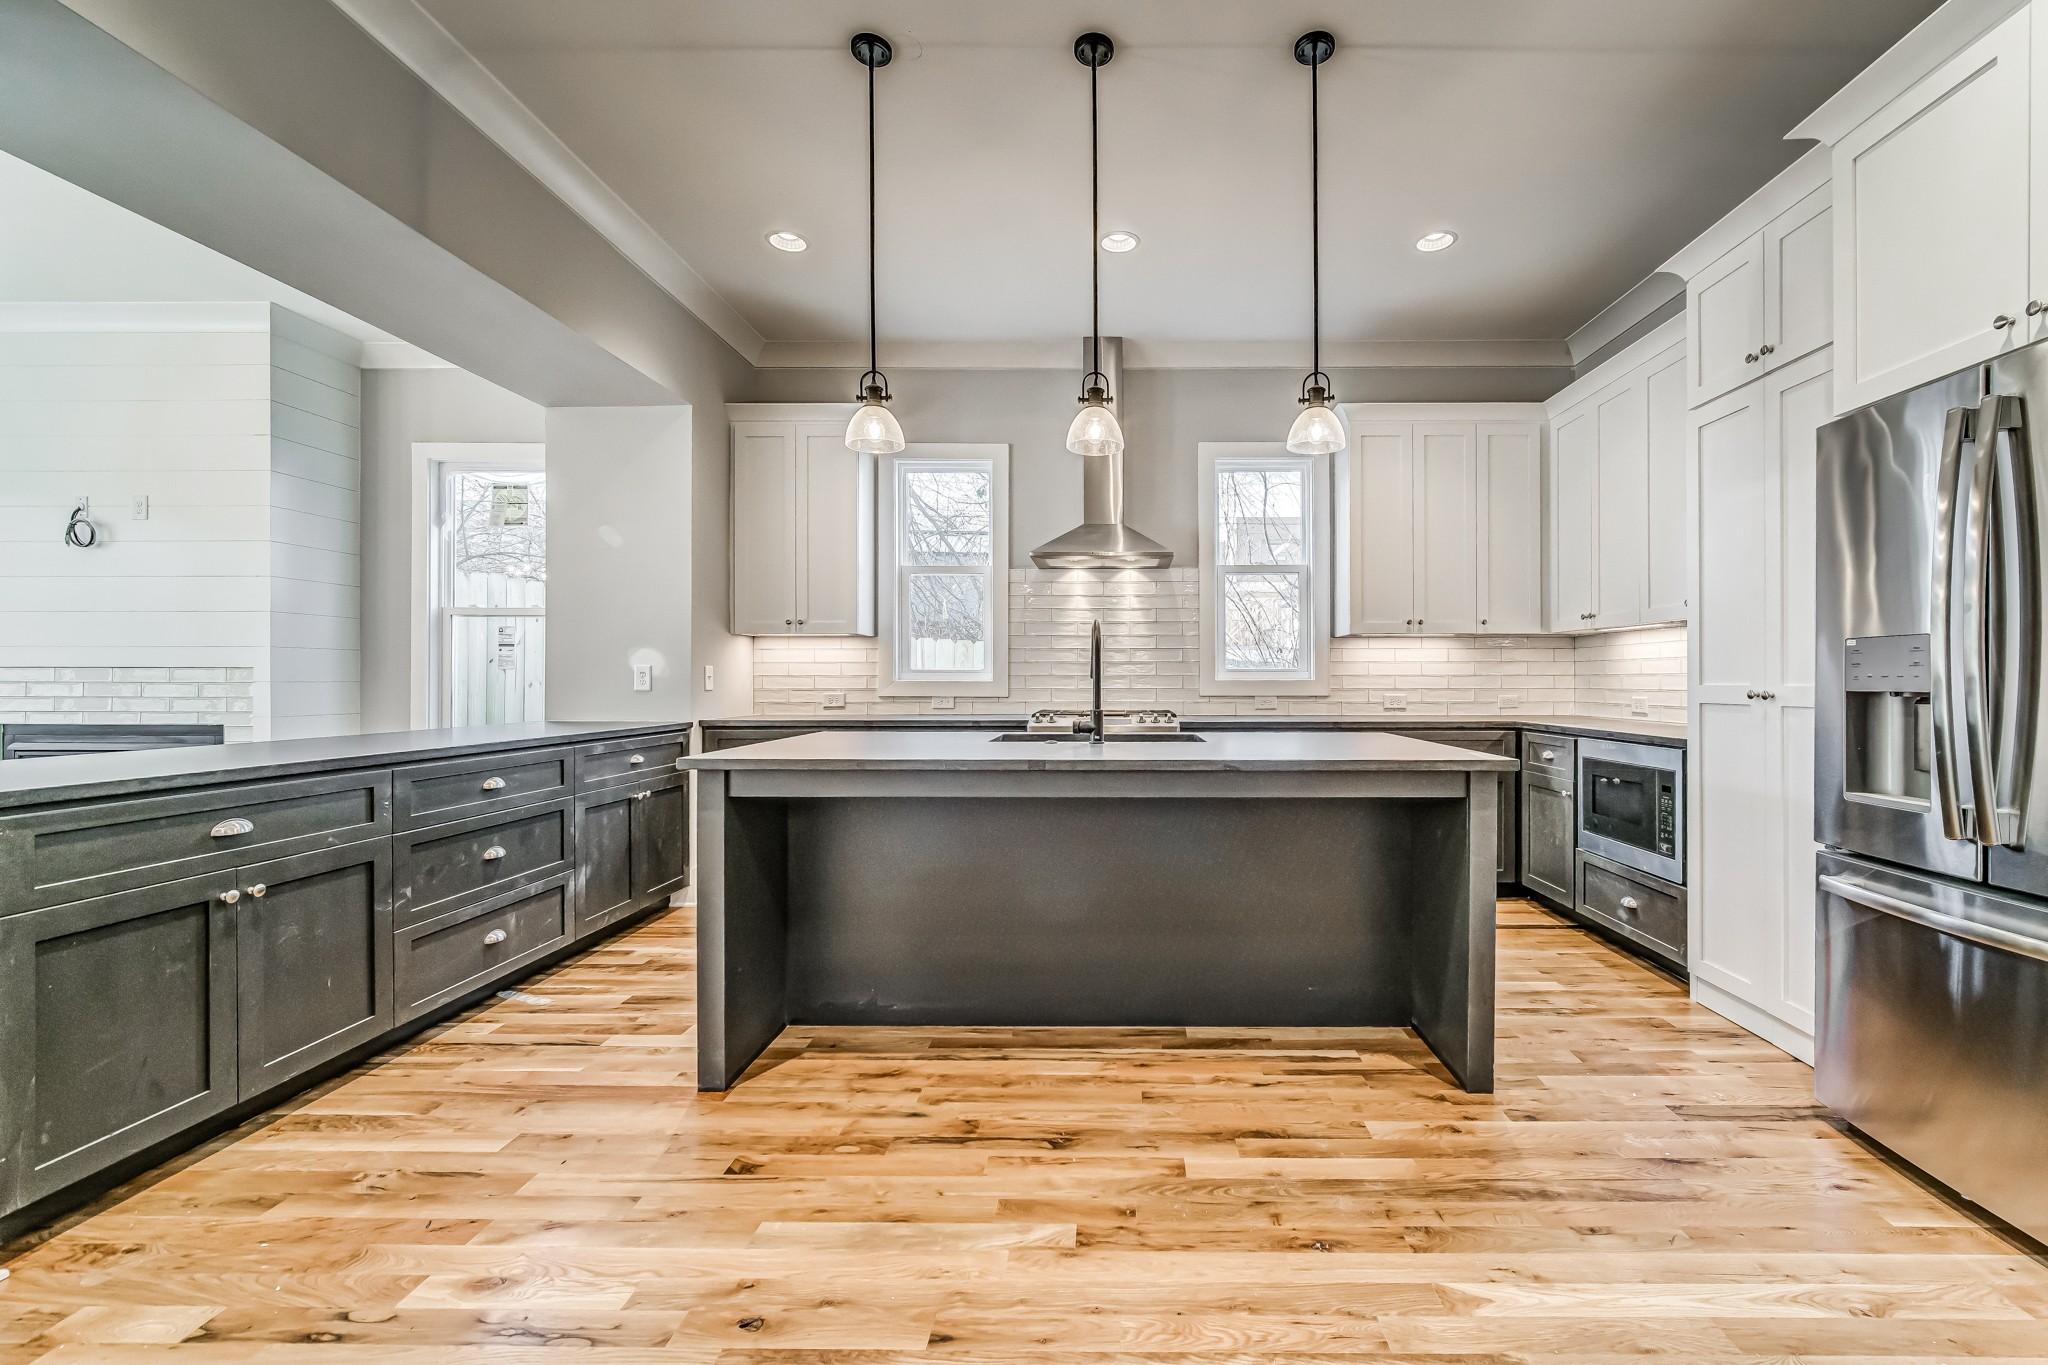 559B Hamilton Avenue, Nashville, TN 37203 - Nashville, TN real estate listing